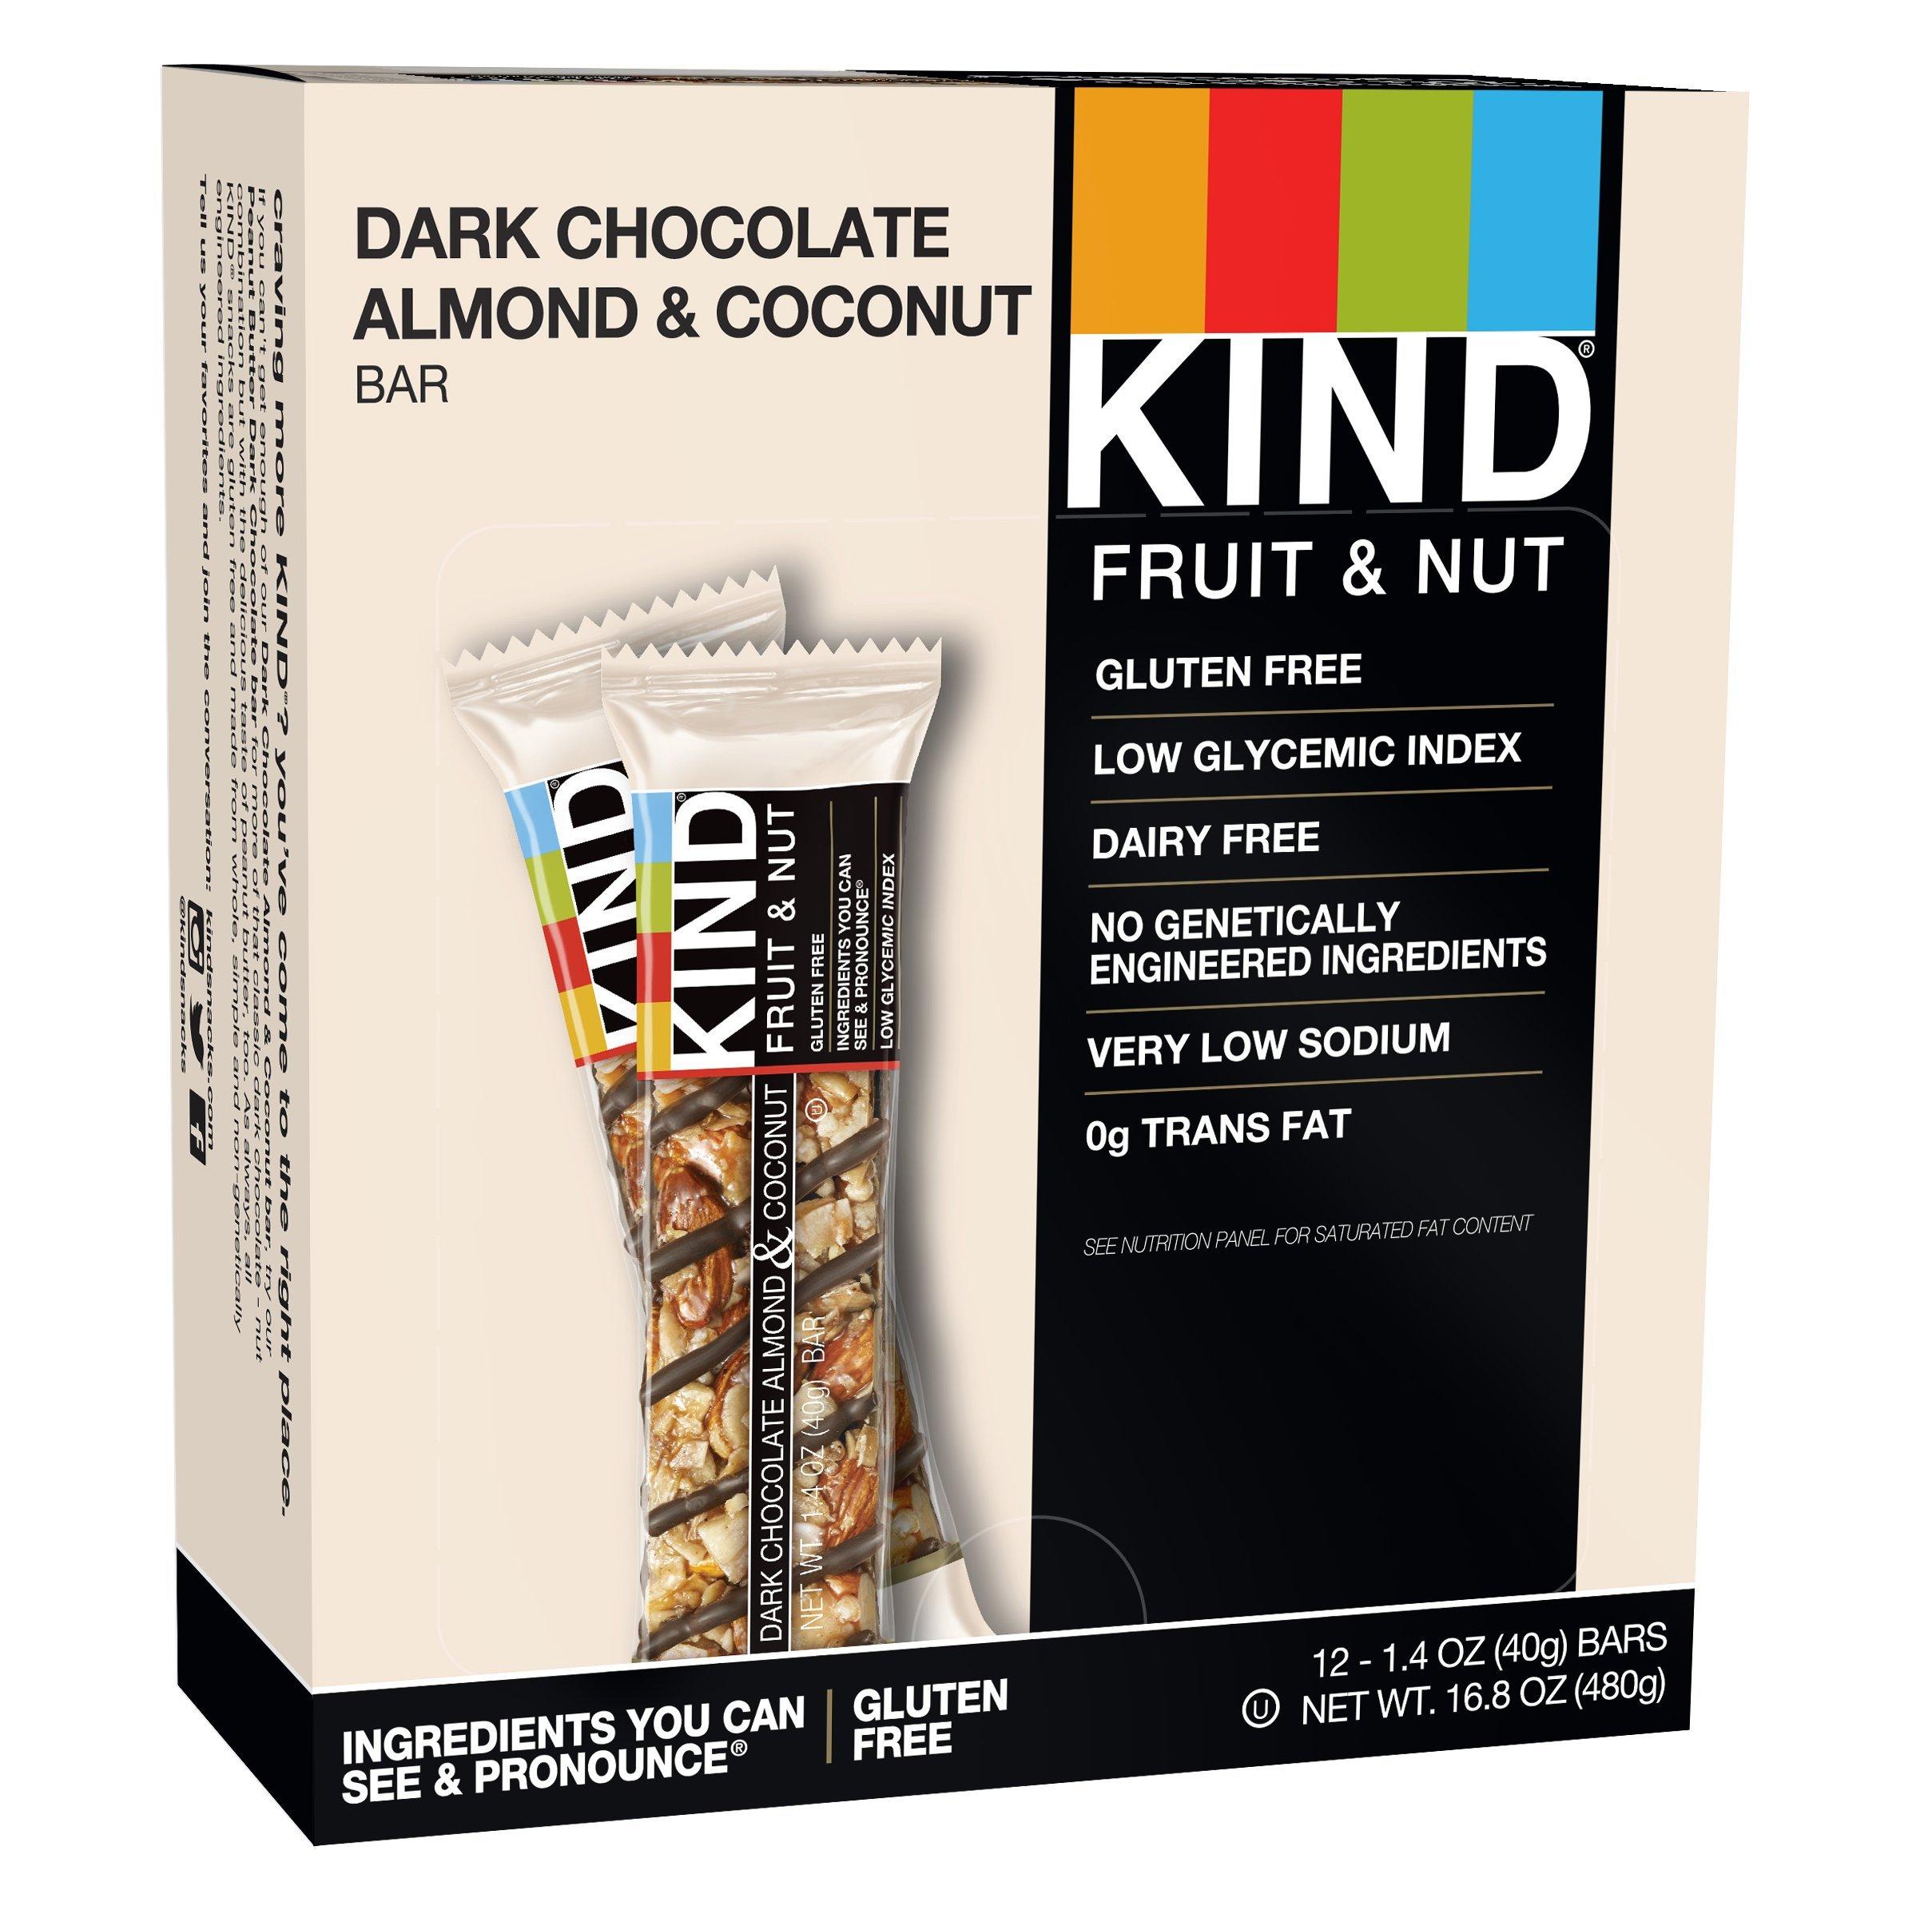 KIND Bars, Dark Chocolate Mocha Almond Coconut, Gluten Free, 1.4oz, 12 Count